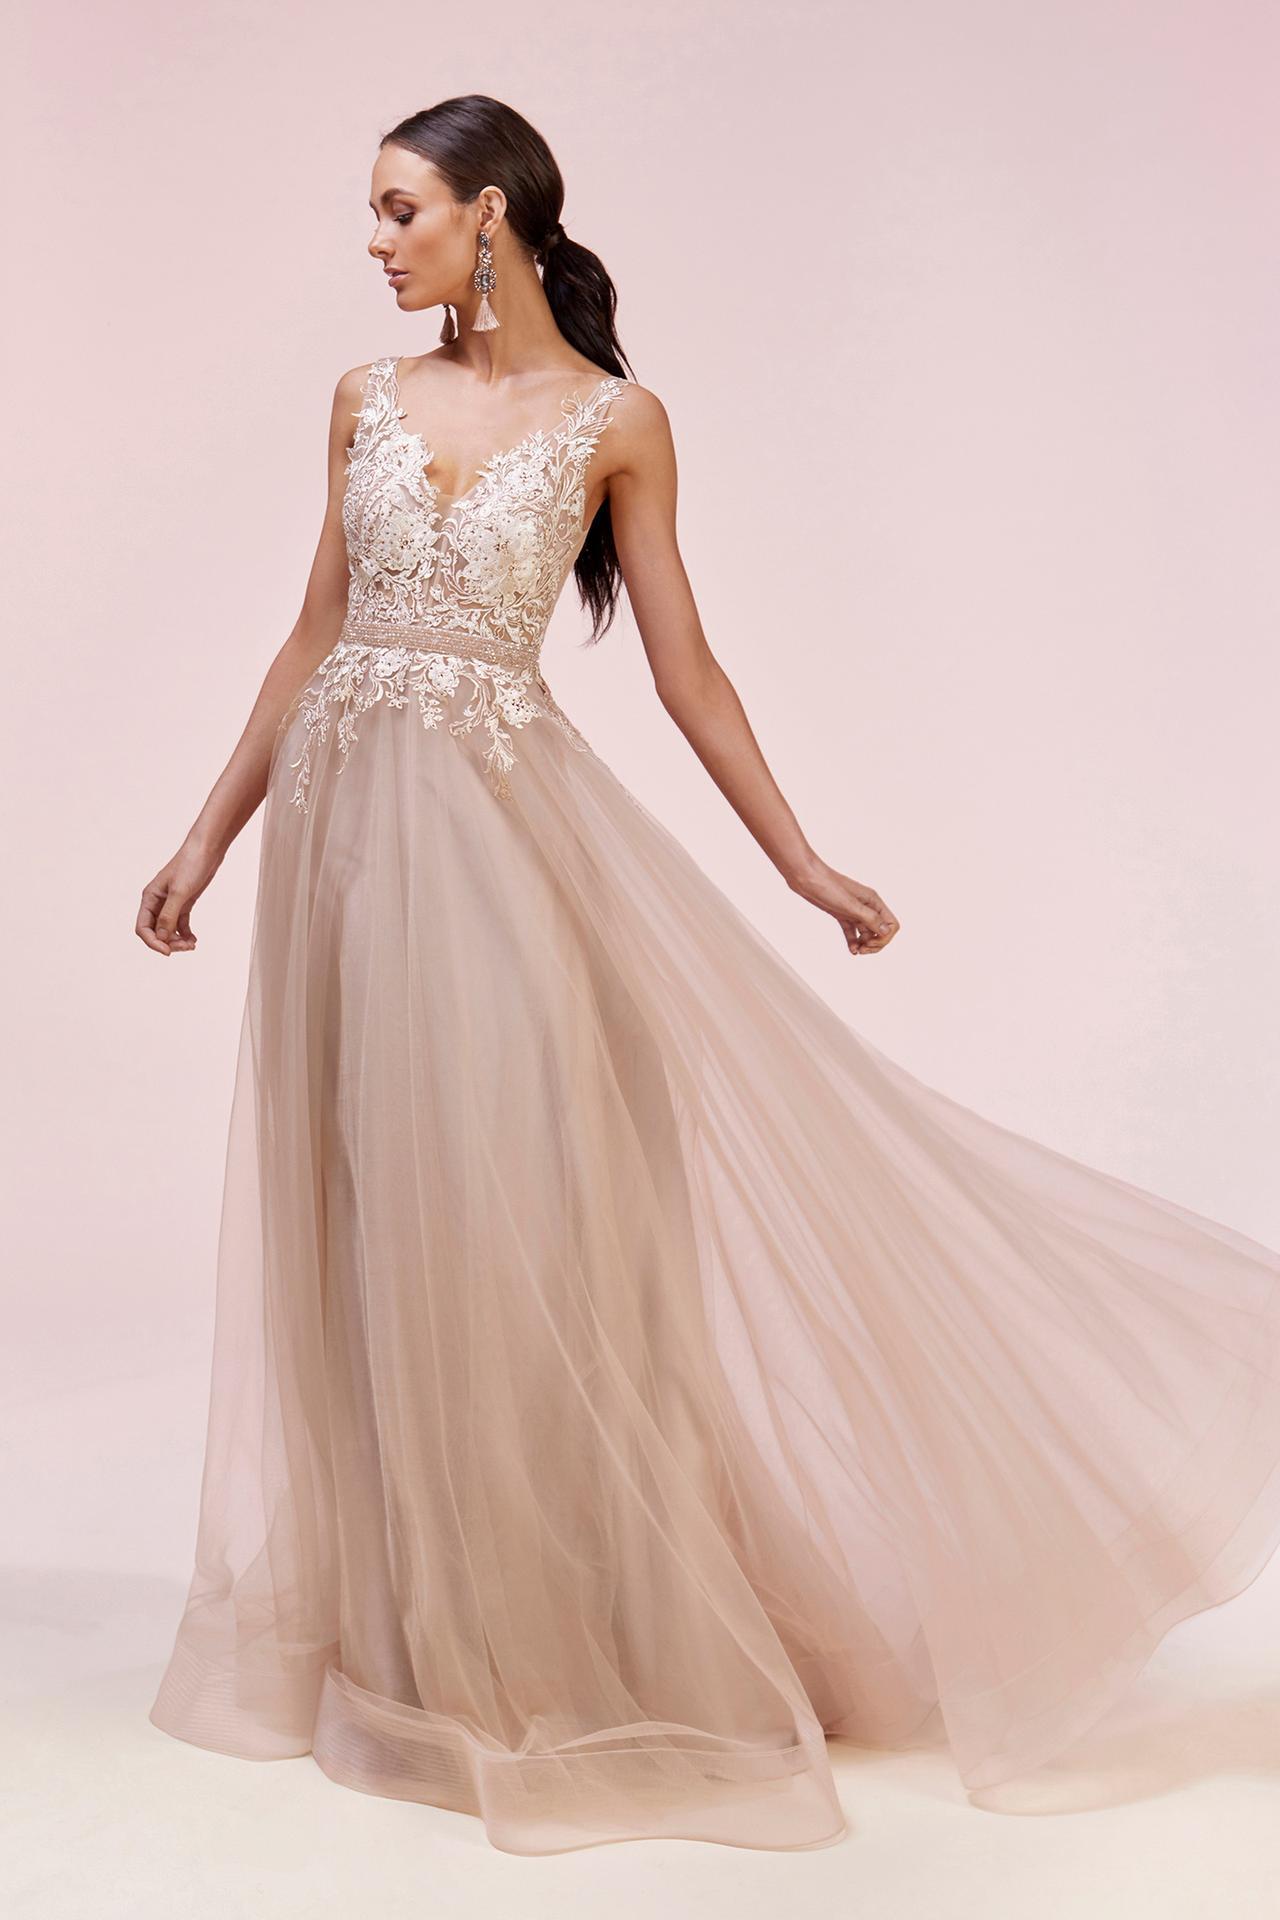 Nové spoločenské šaty :) - Obrázok č. 22